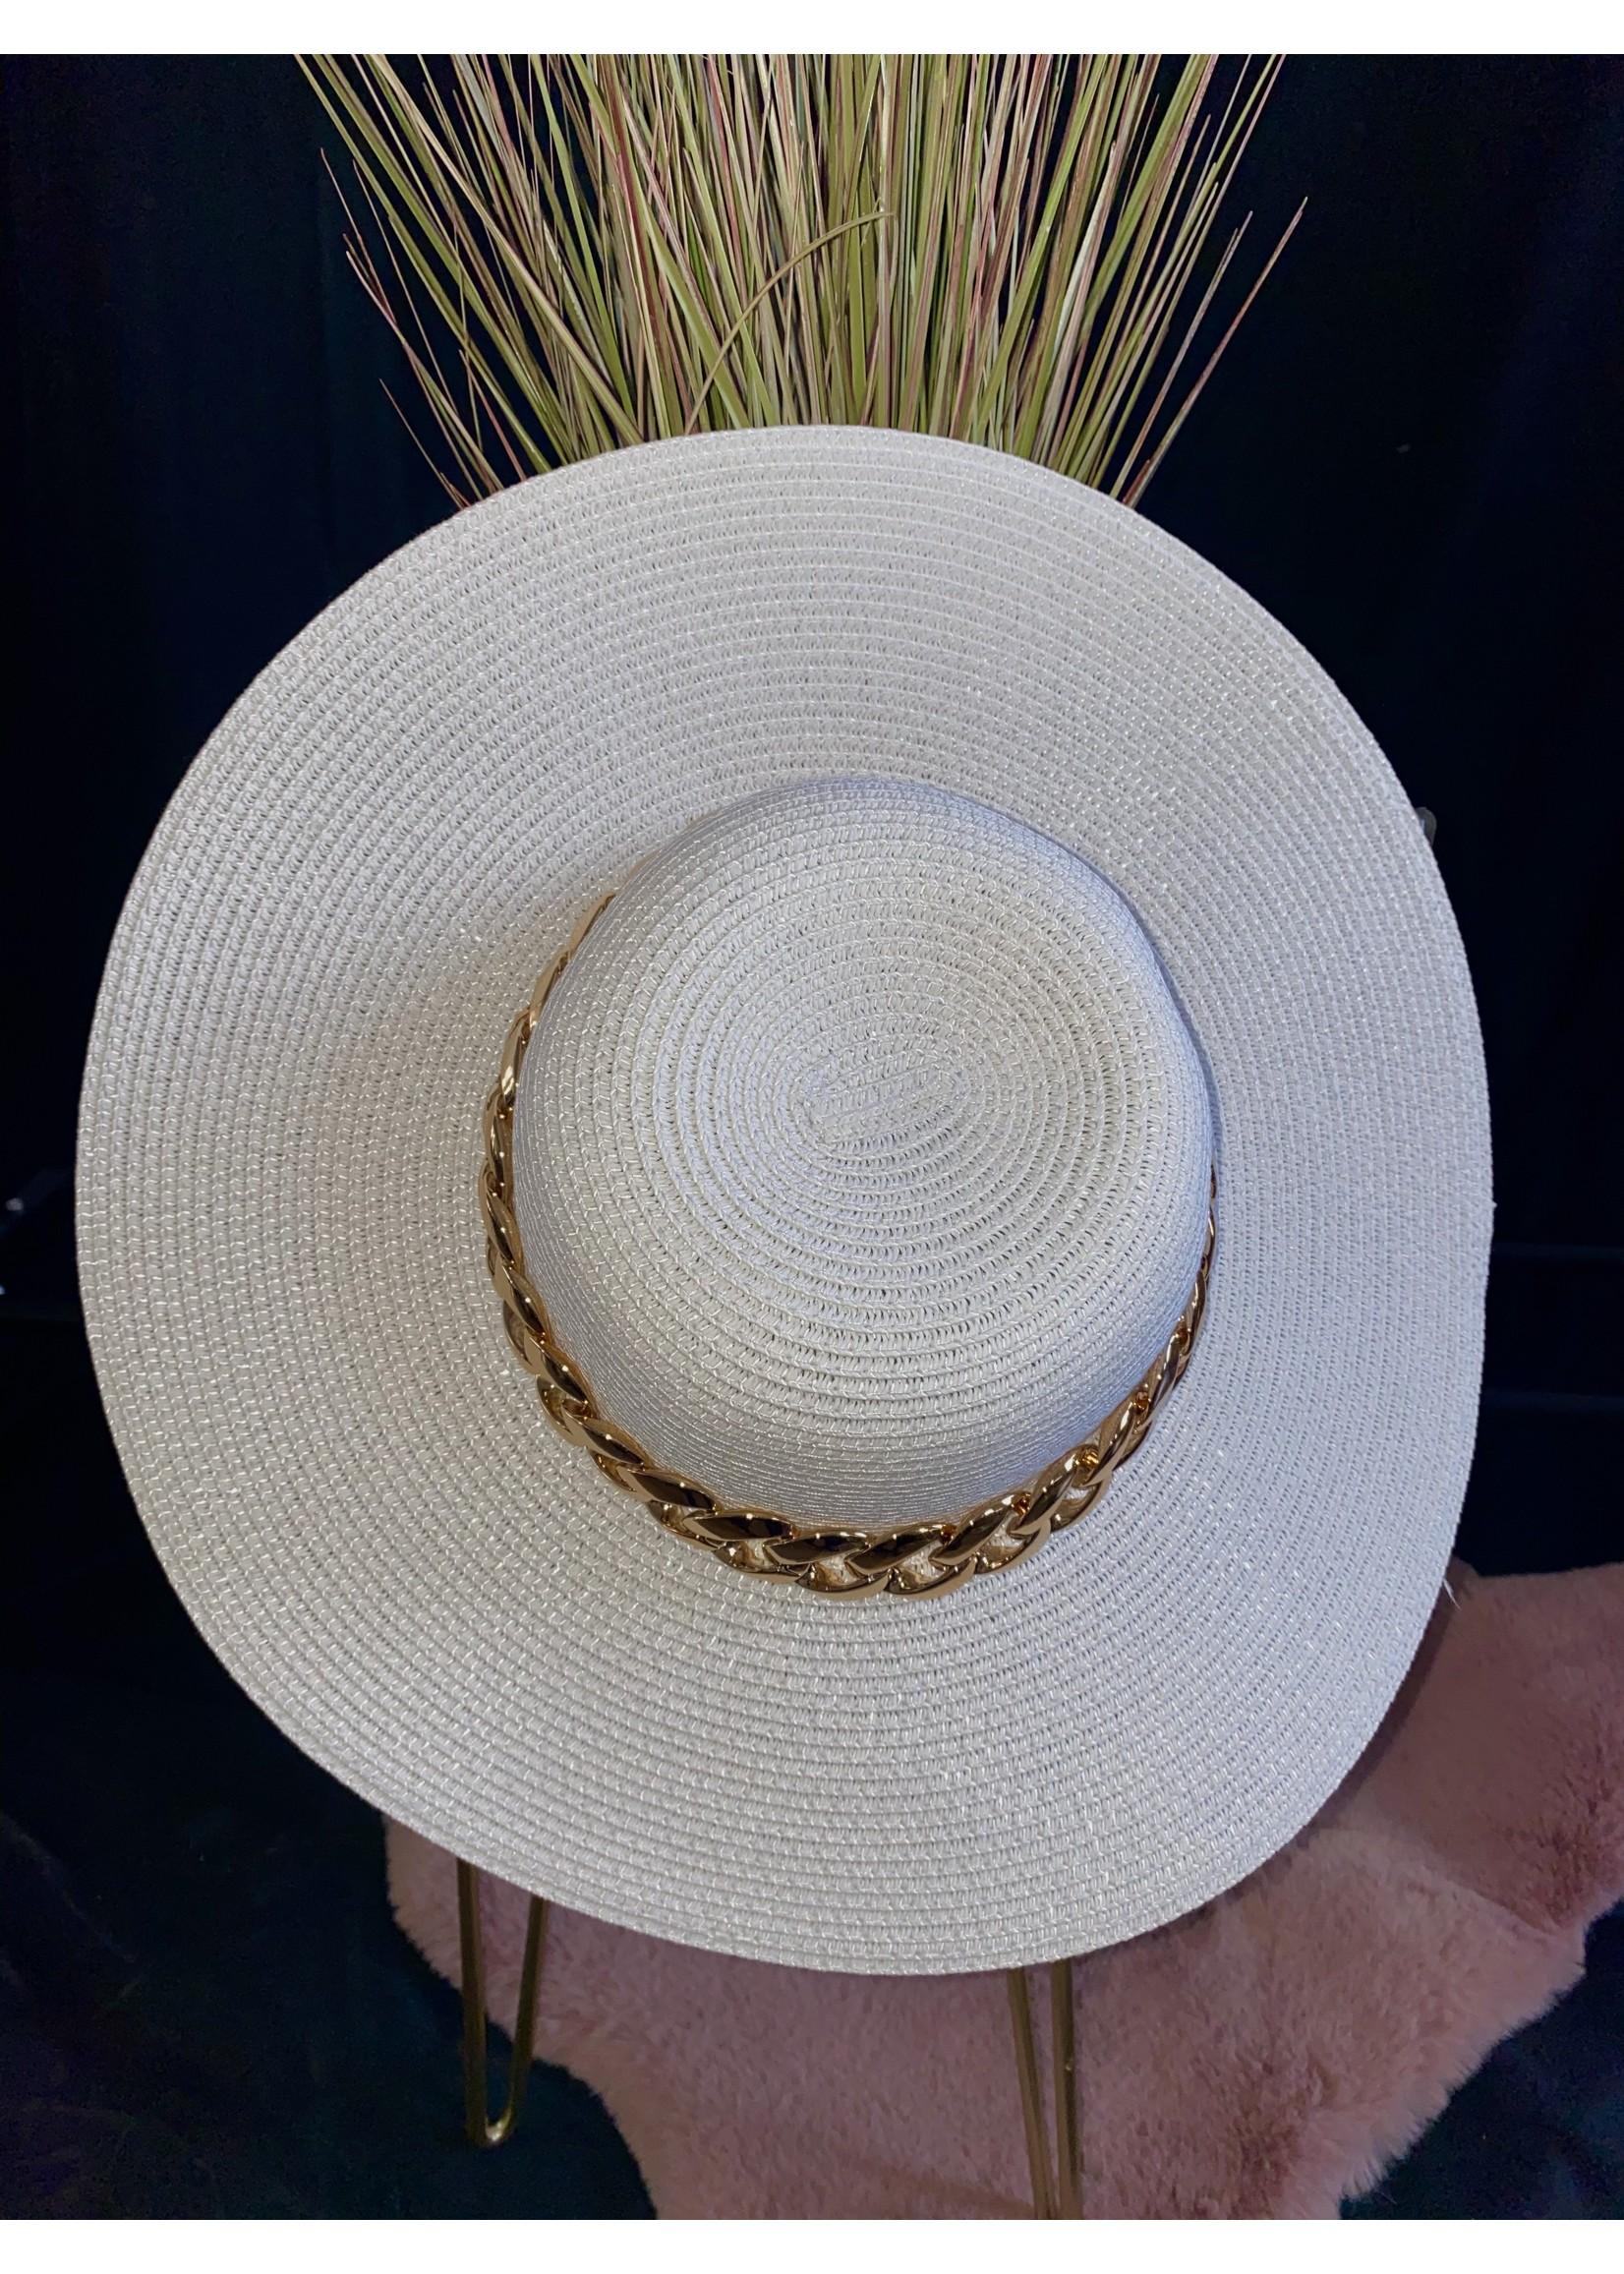 Keely sun hat